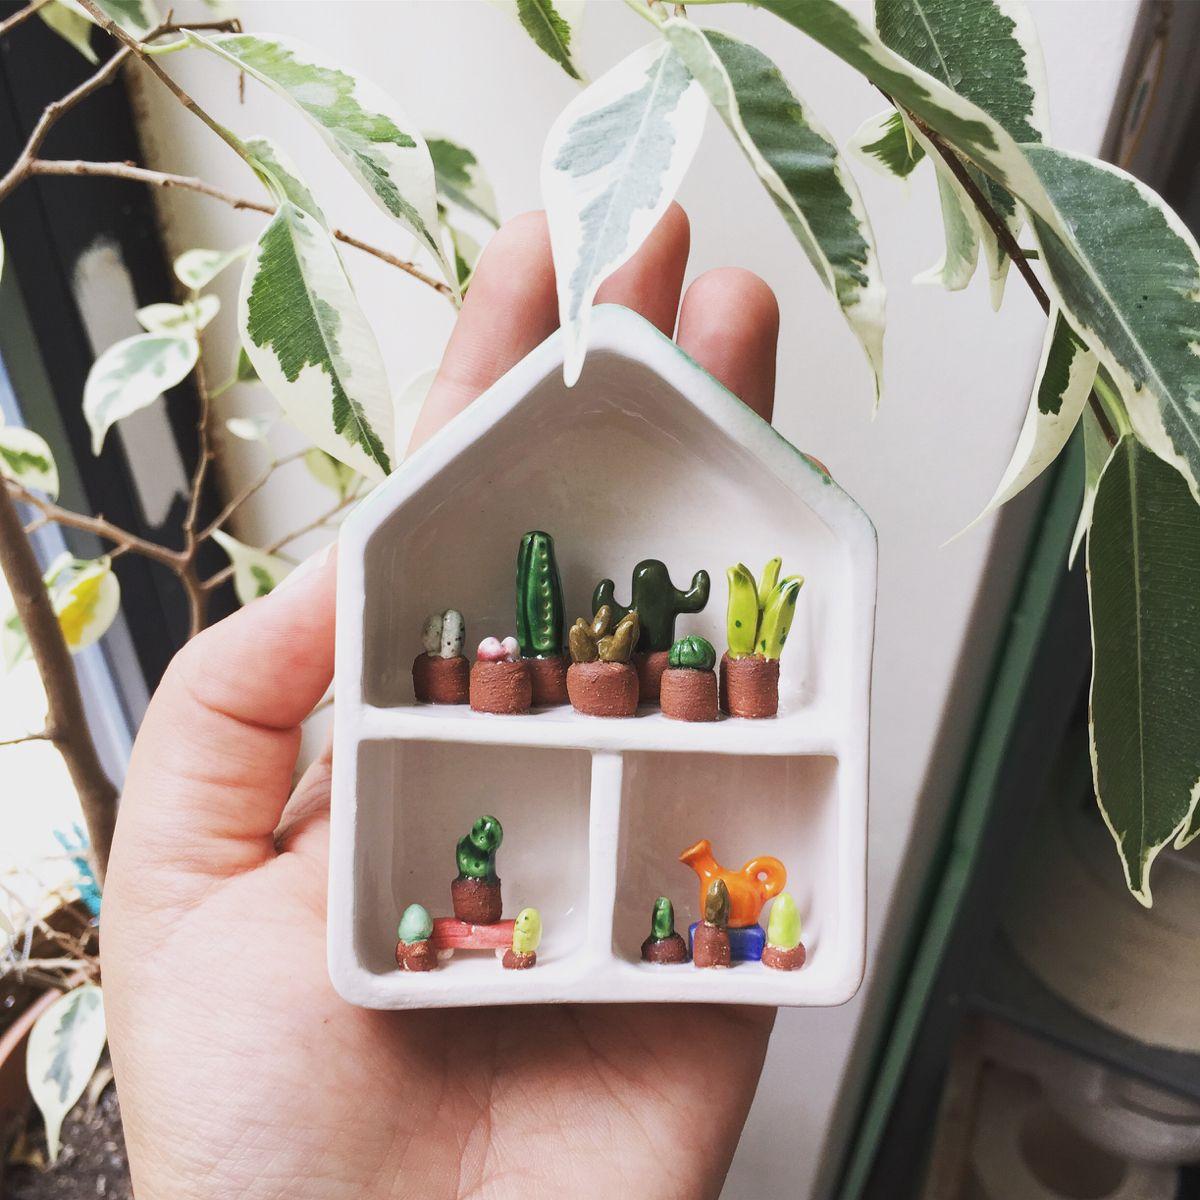 #etsy #etsyshop #etsyseller #ceramic #ceramics #pottery #house #miniatureceramics #miniature #tiny #collector #colorful #handmade #handmadeceramic #beticeramic #istanbul #seramik #ceramichouse #potteryforall